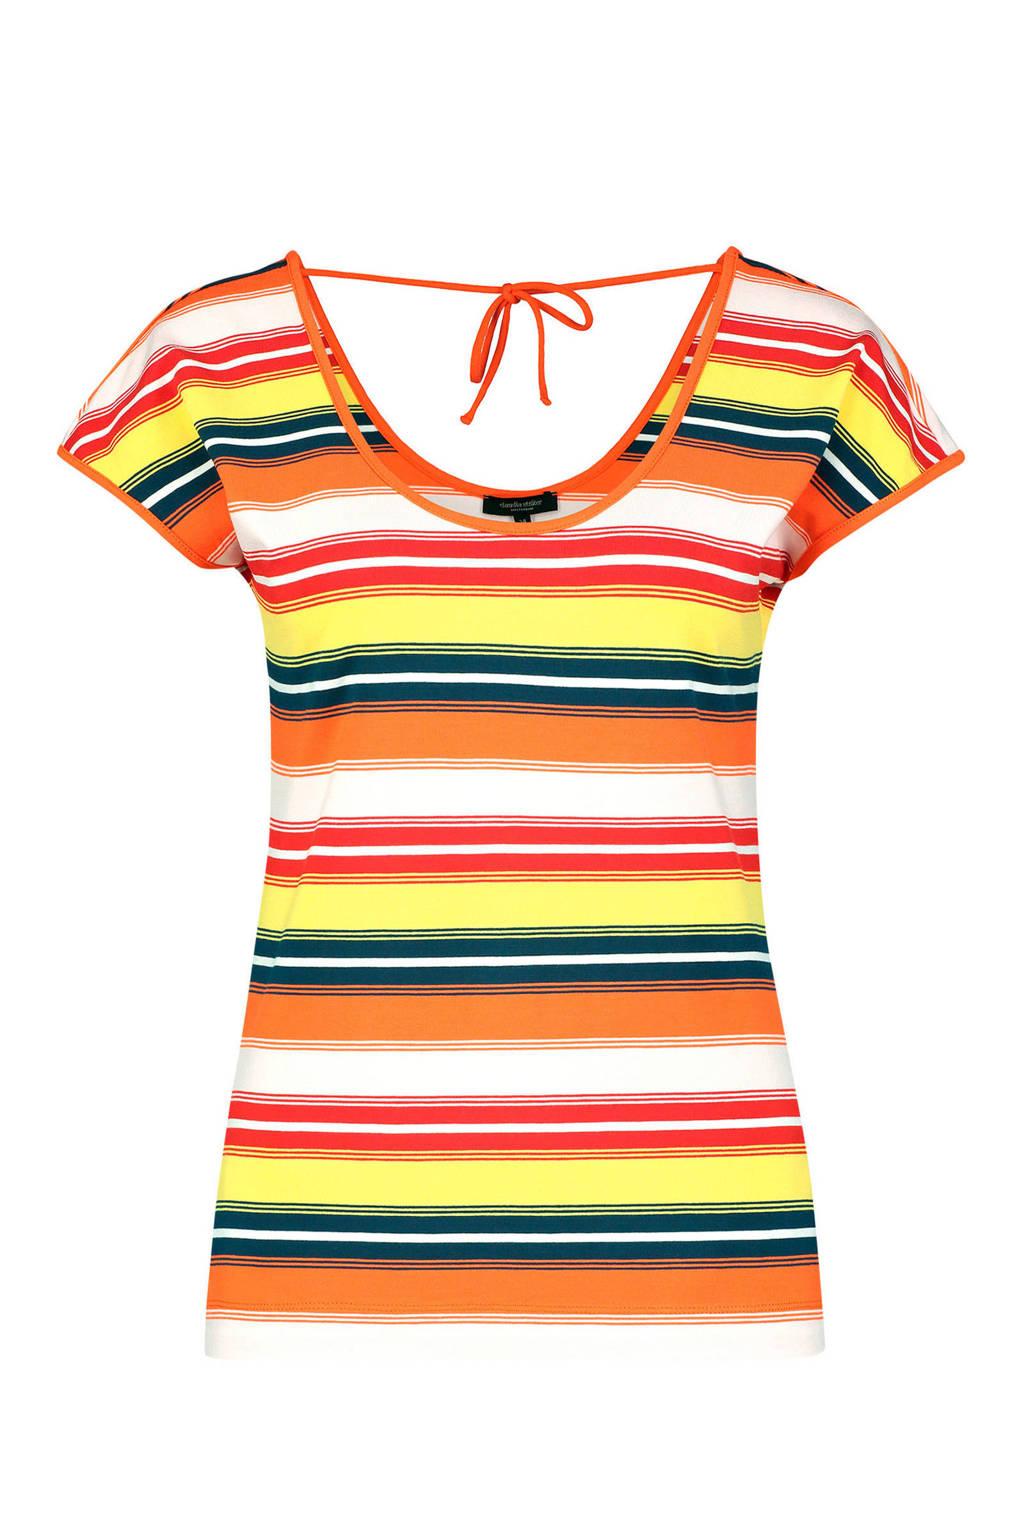 Claudia Sträter gestreept T-shirt oranje, oranje/wit/geel